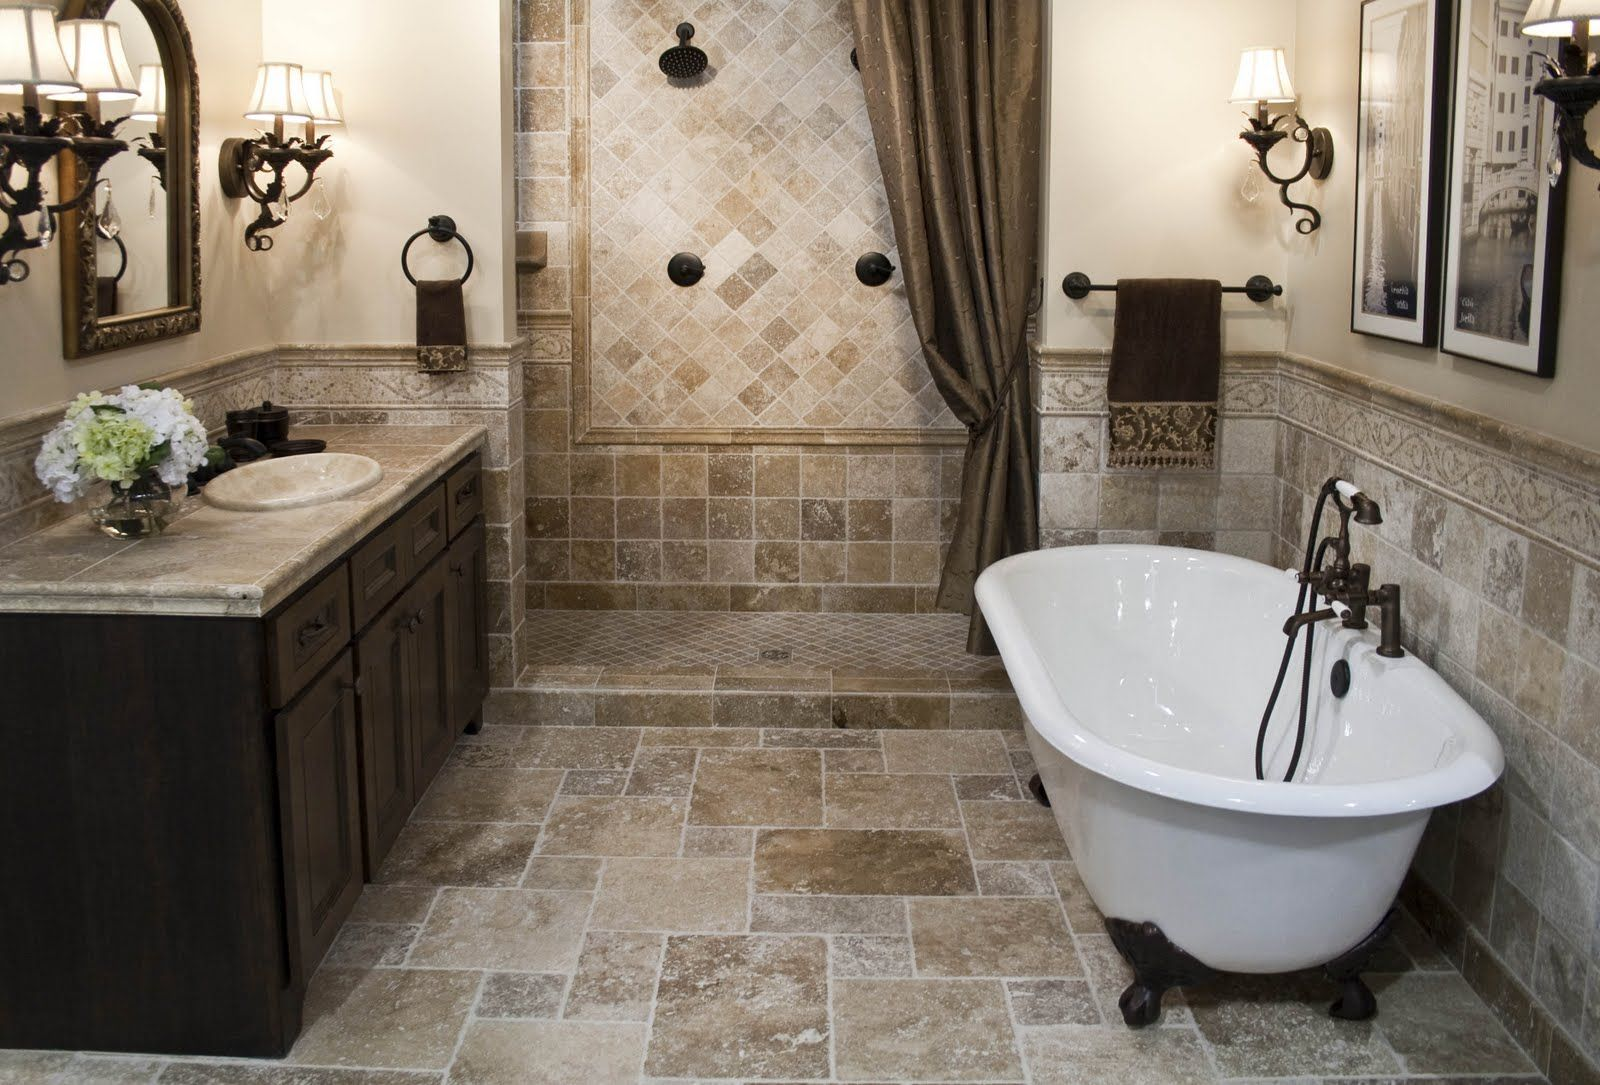 Diy Bathroom Remodel Ideas For Average People Simple Bathroom Remodel Simple Bathroom Bathroom Tile Designs